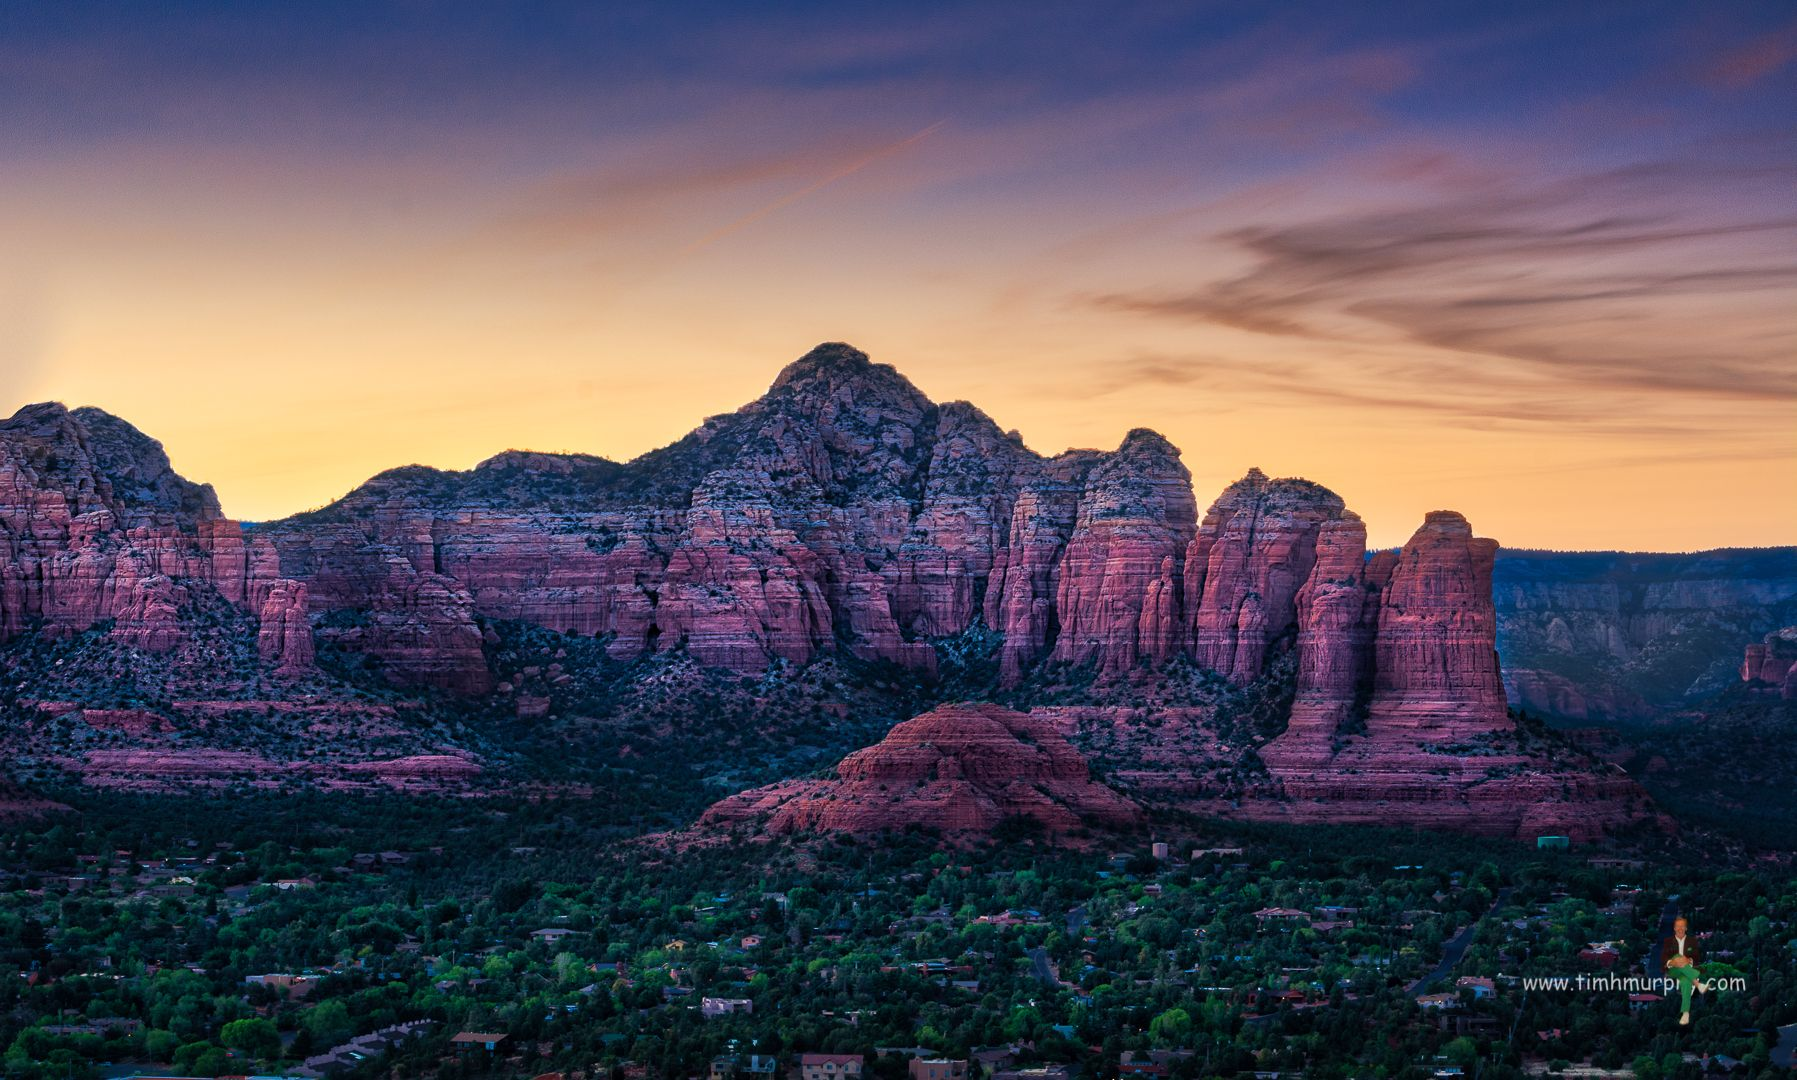 Coffee Pot Rock, Sedona, Arizona sedona arizona travel